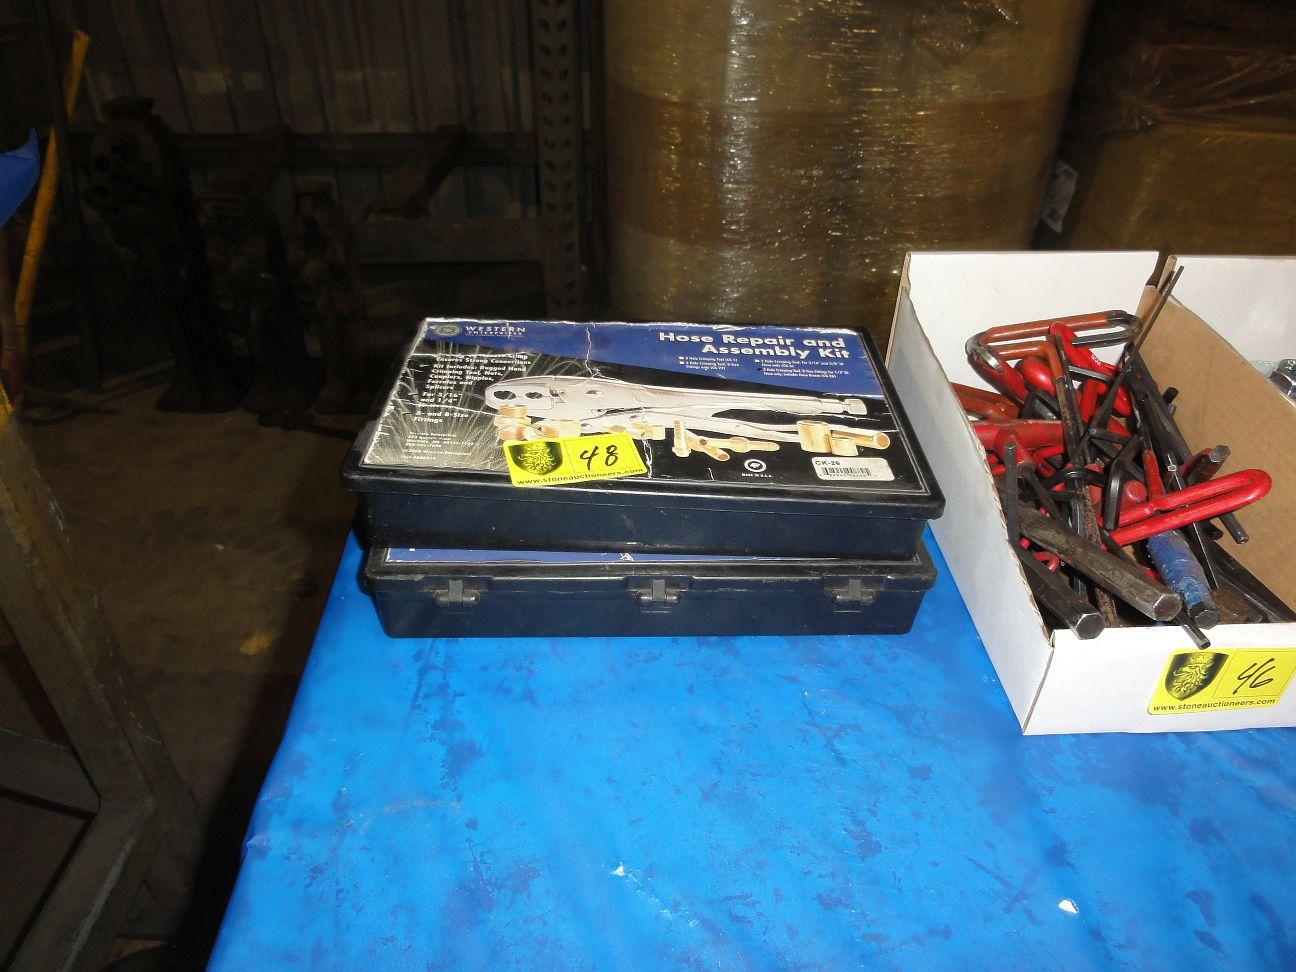 Lot 48 - Hose Repair Kits